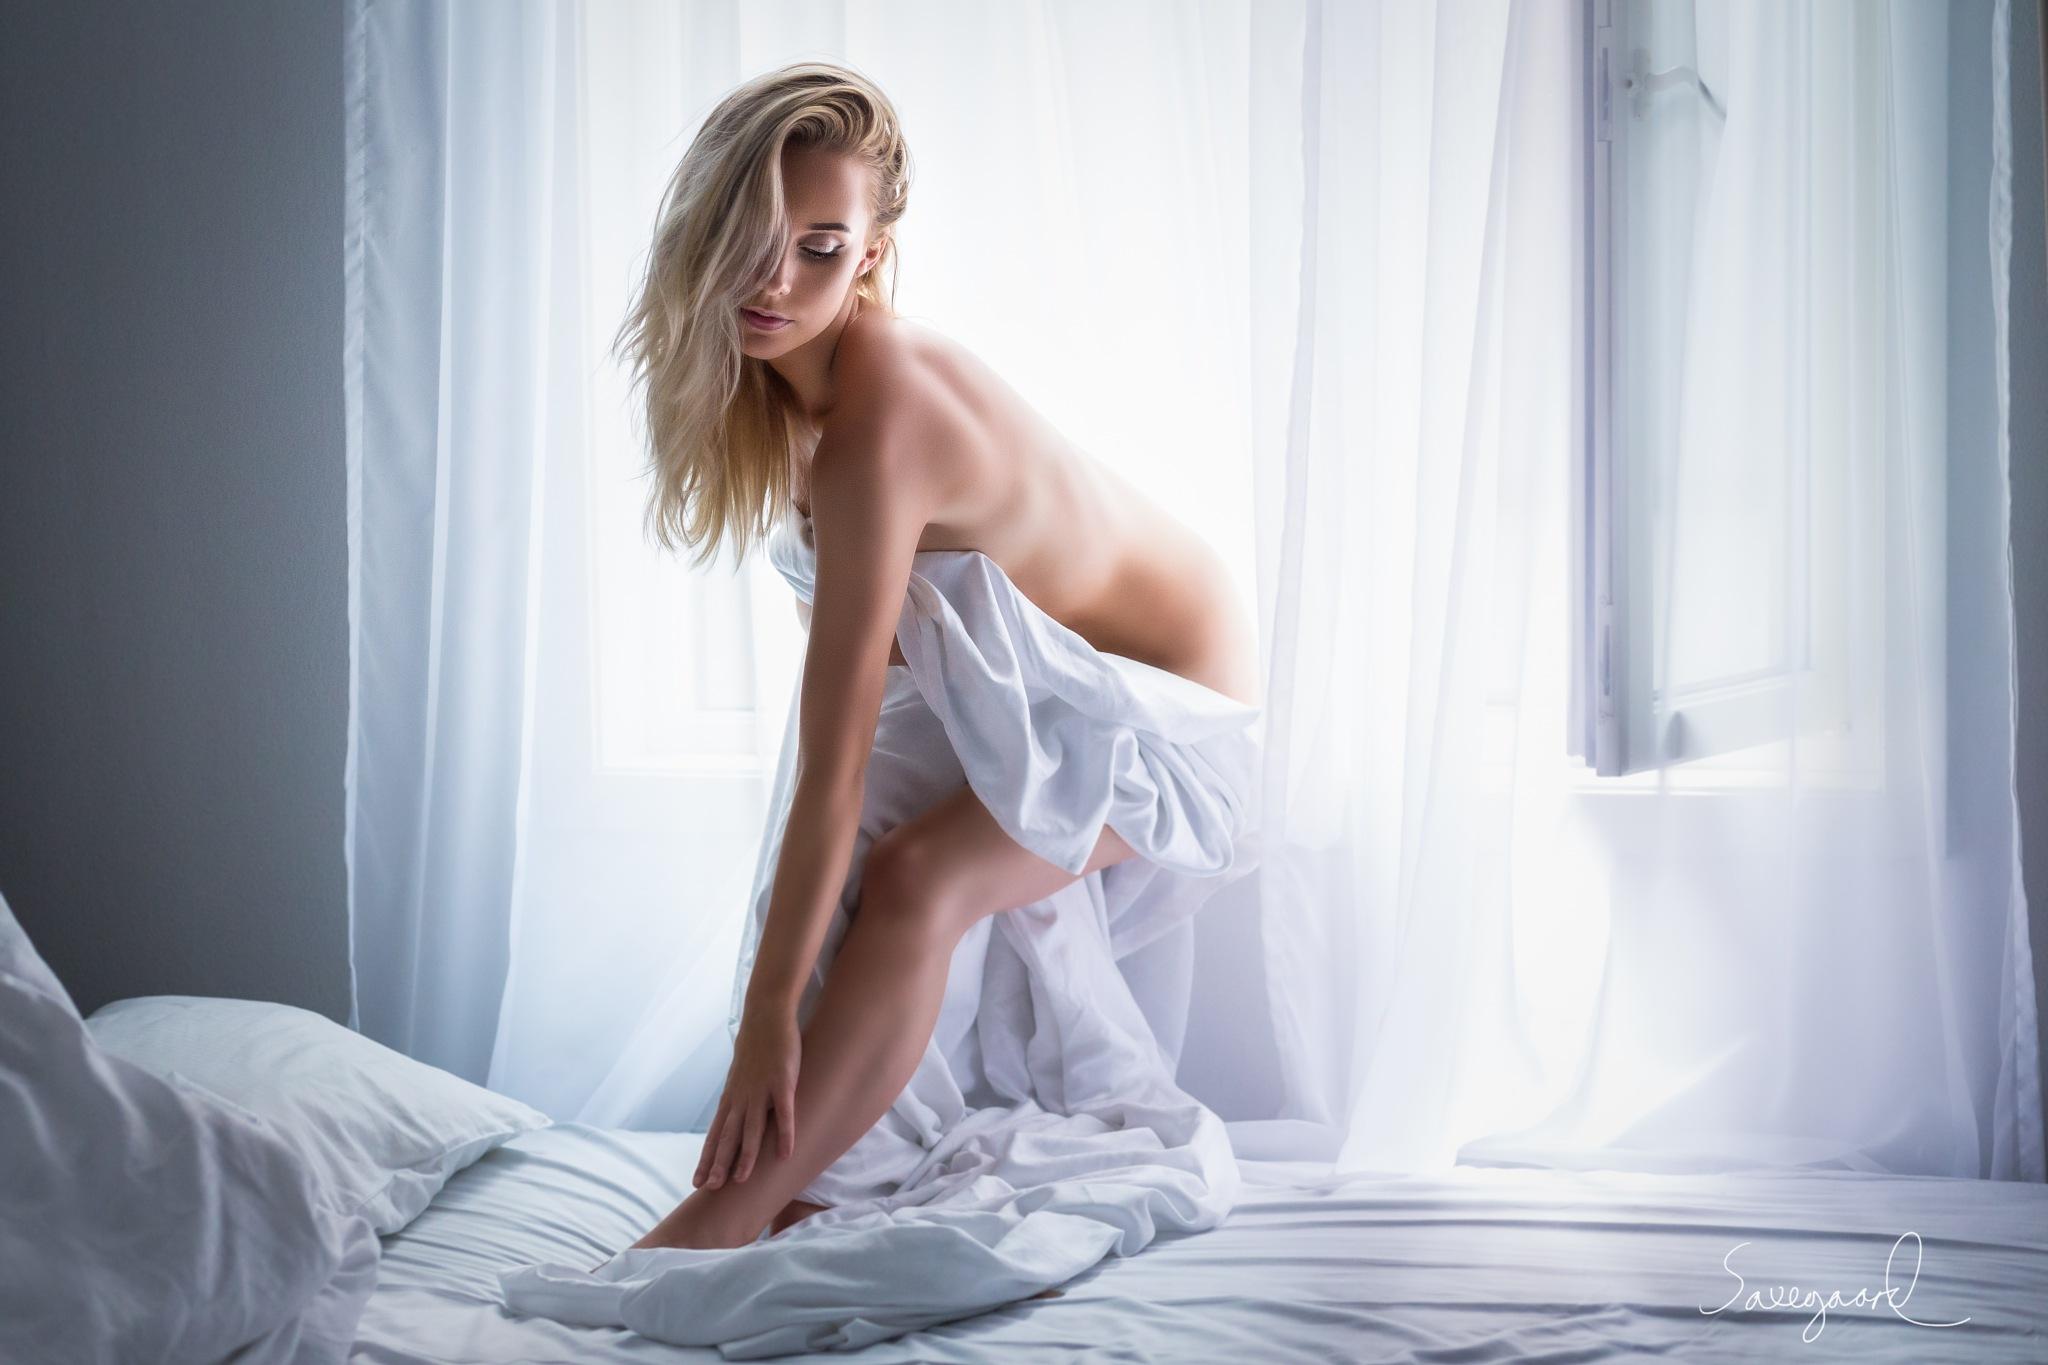 Hannah Aurora by Saxegaard Photography